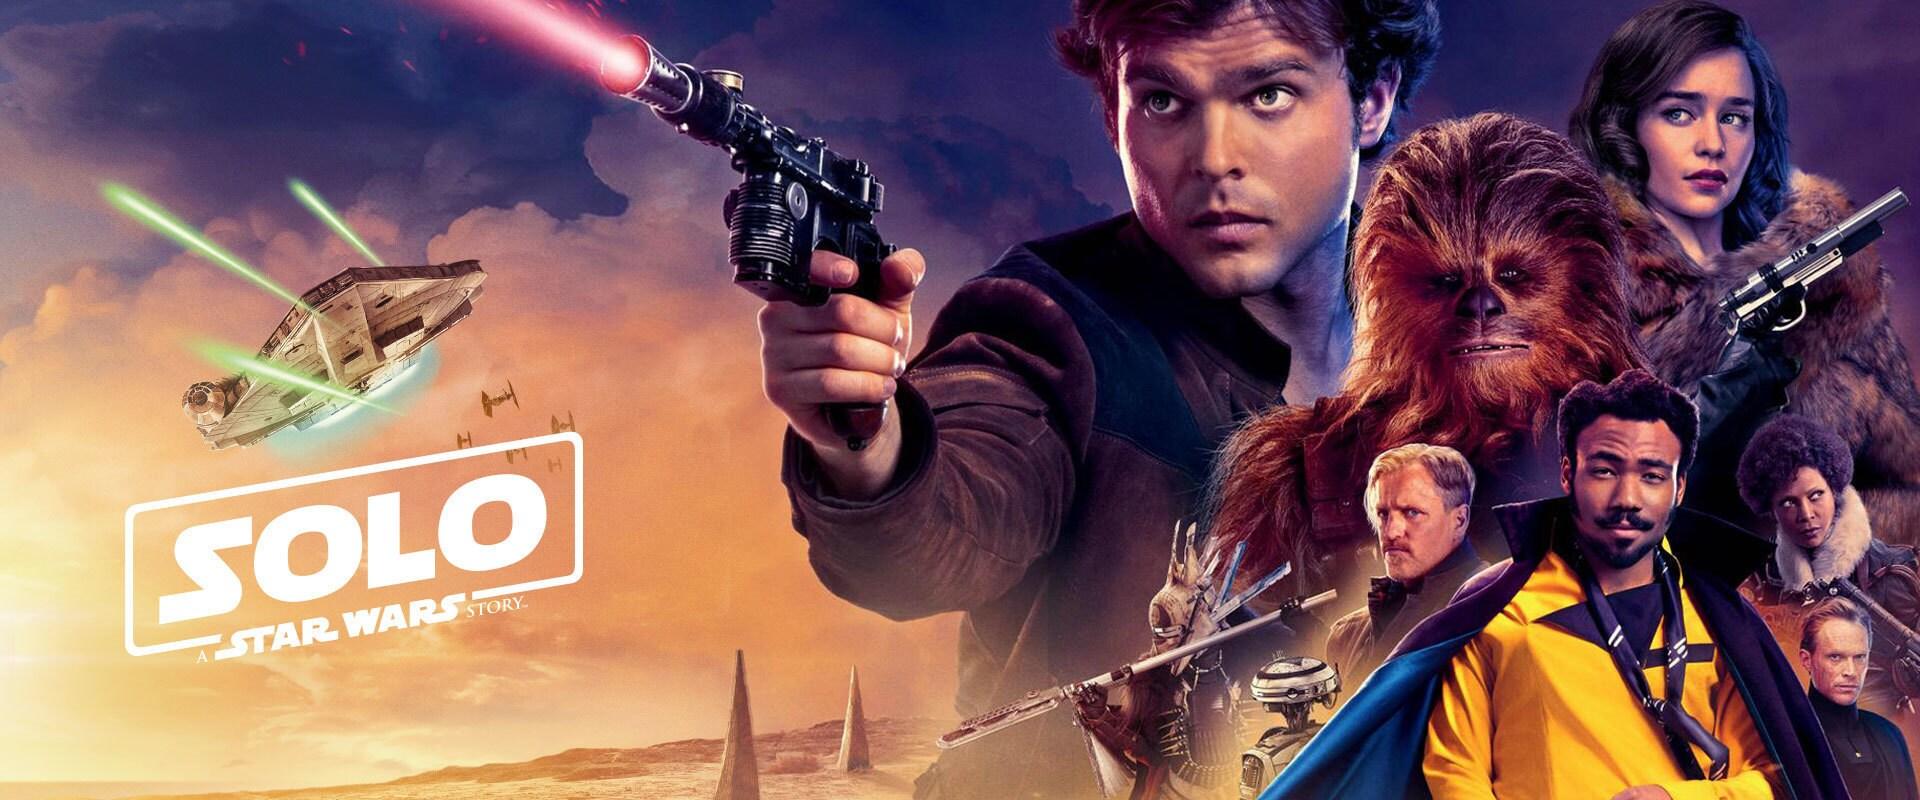 Solo A Star Wars Story - Emea Banner